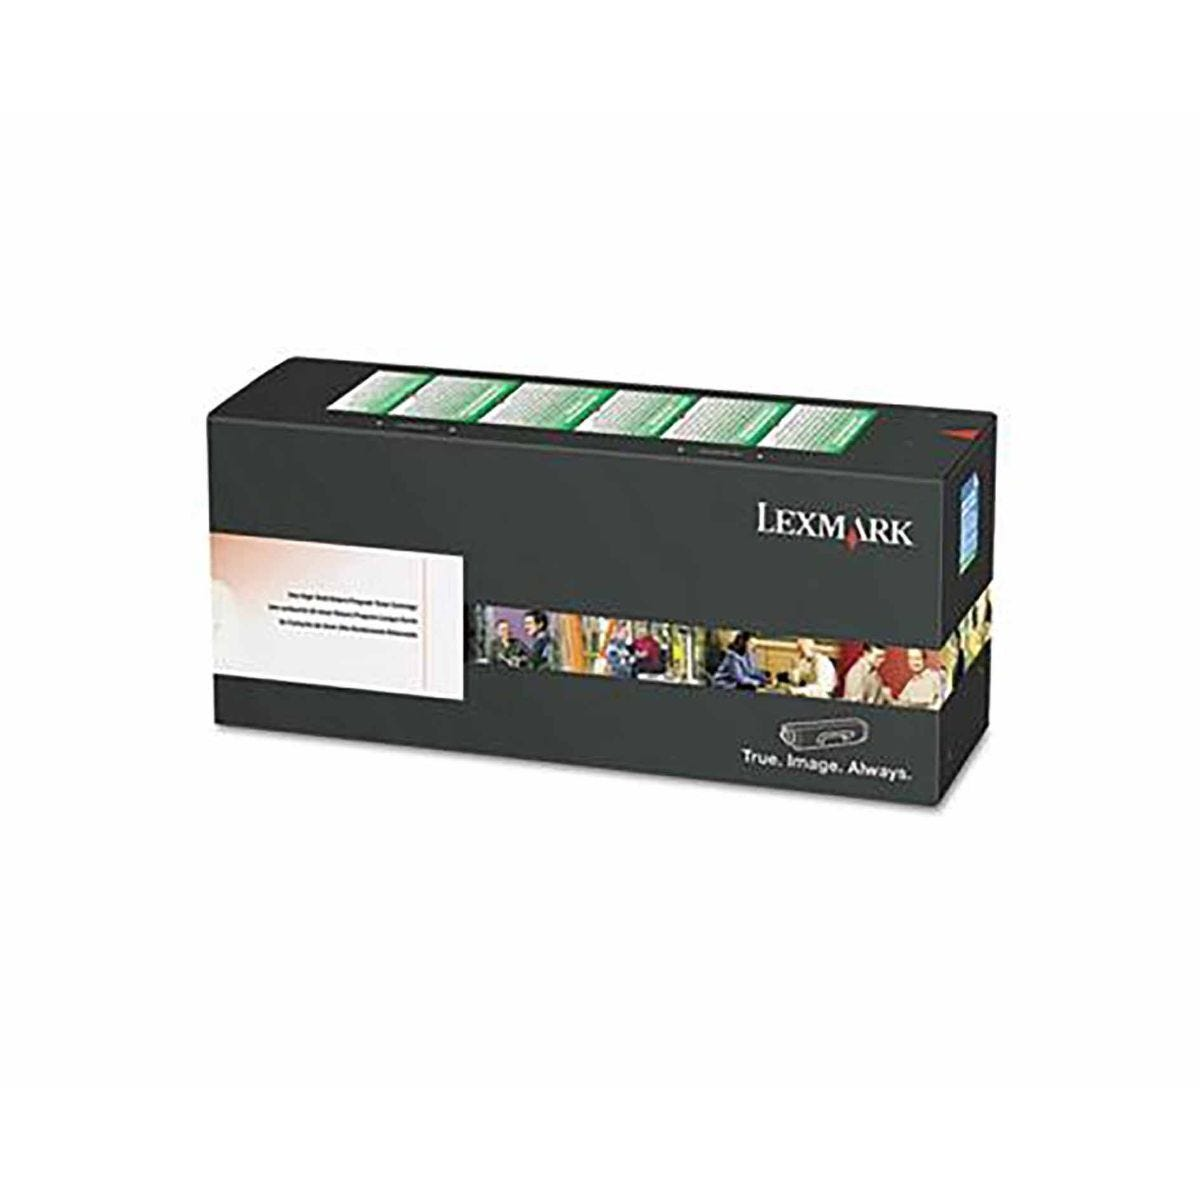 Lexmark 72K20K0 Black Original Toner Cartridge